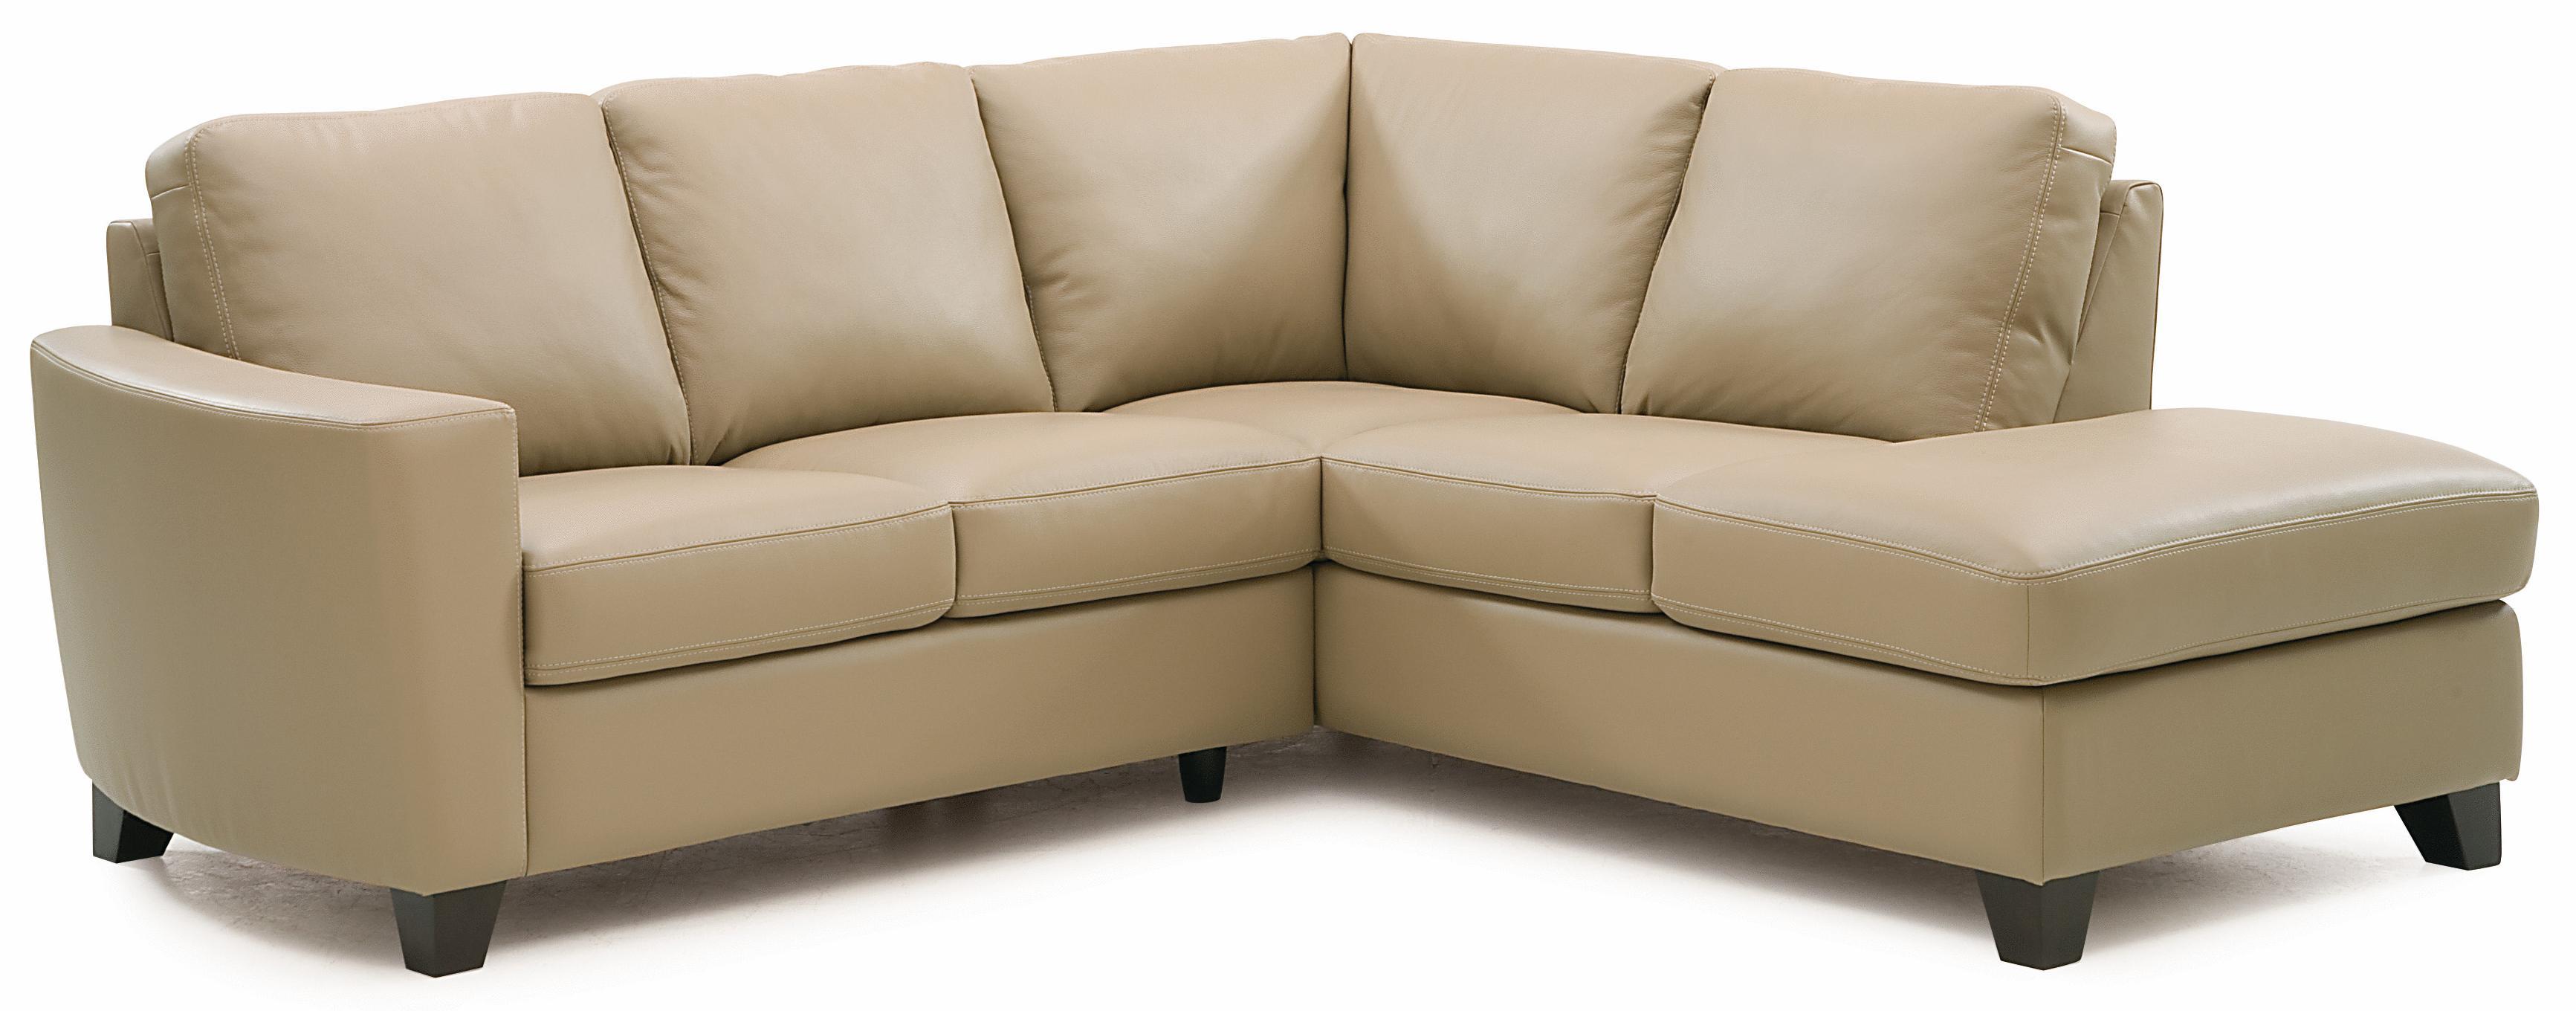 Leeds 2 pc. Sectional by Palliser at Mueller Furniture